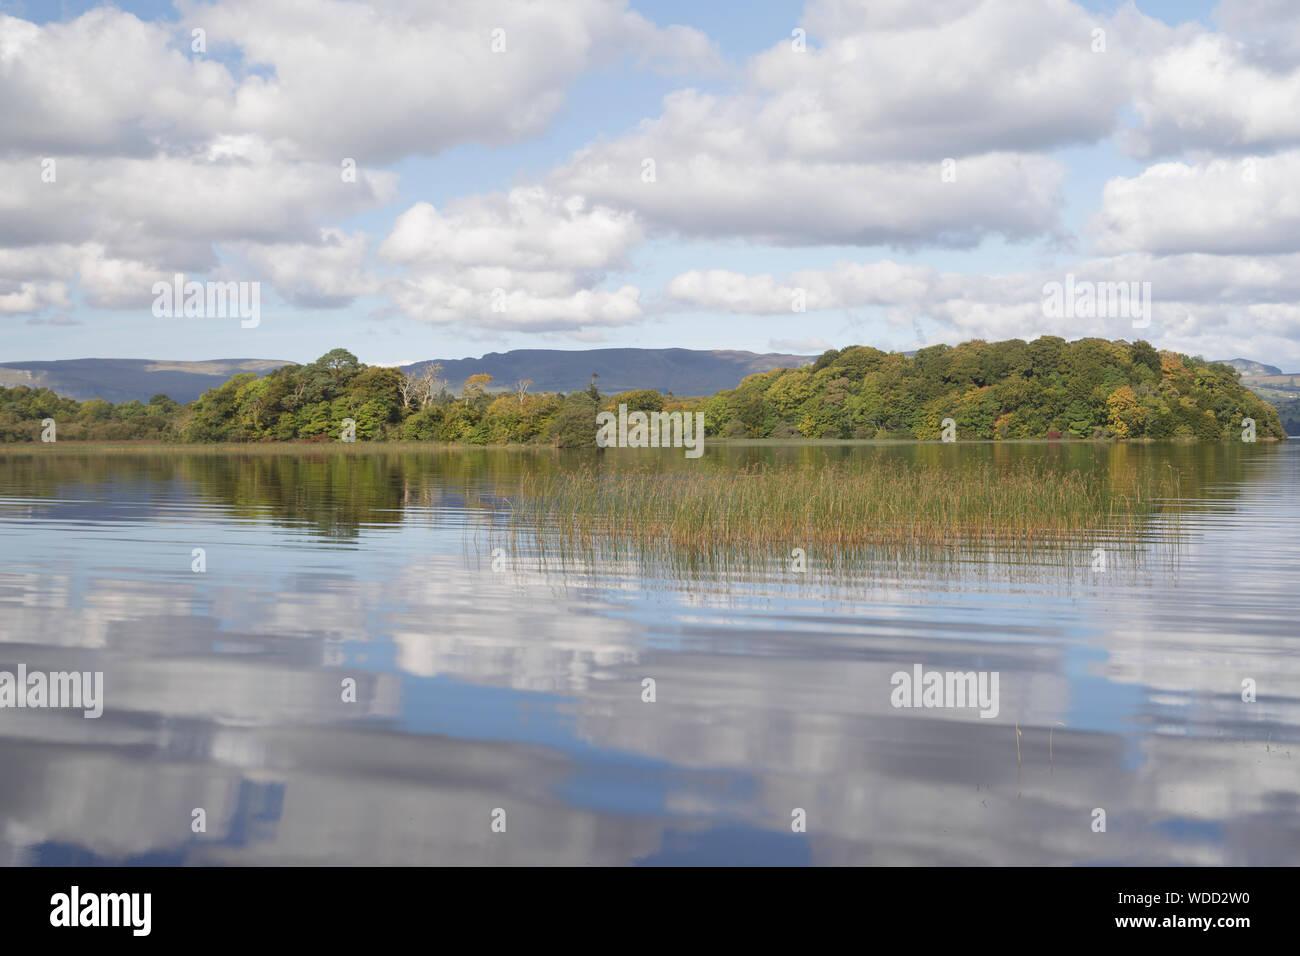 Lough Gill in County Sligo, Ireland. Stock Photo